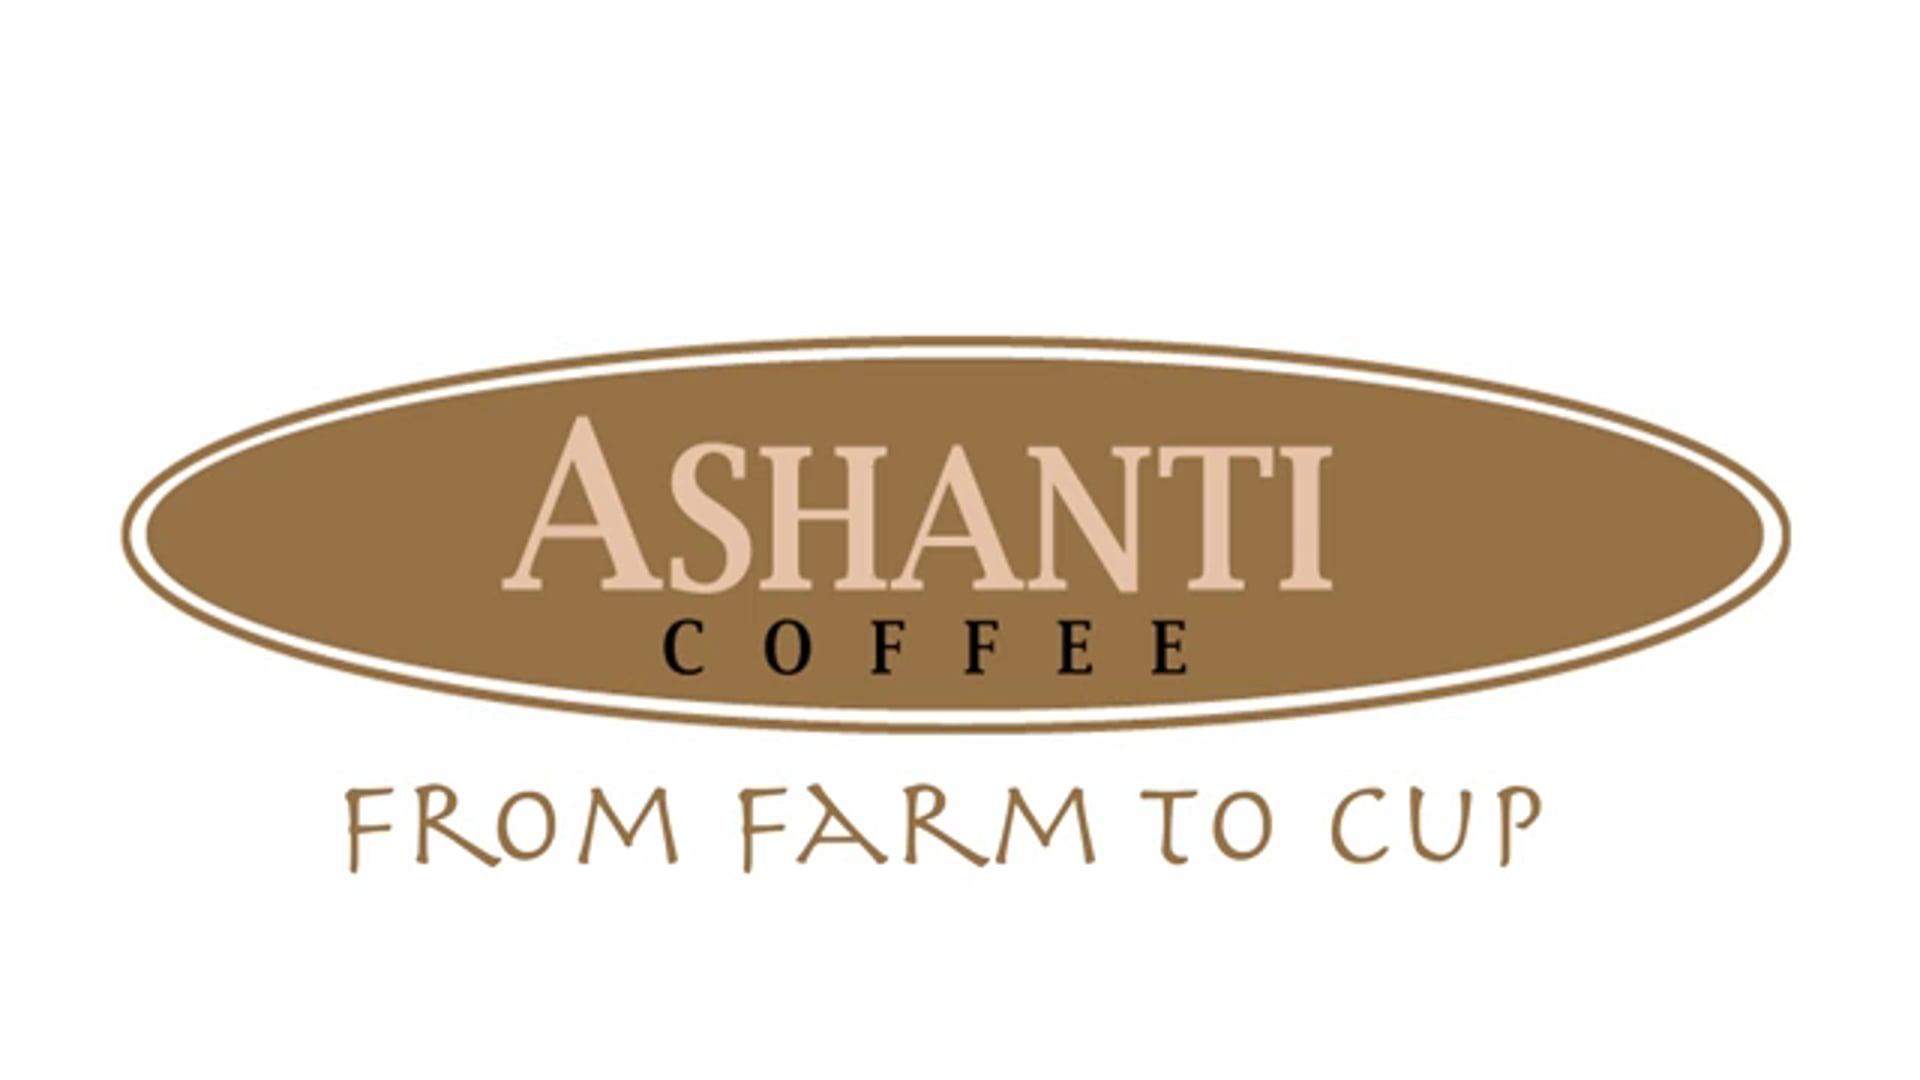 Ashanti Coffee - From Farm To Cup